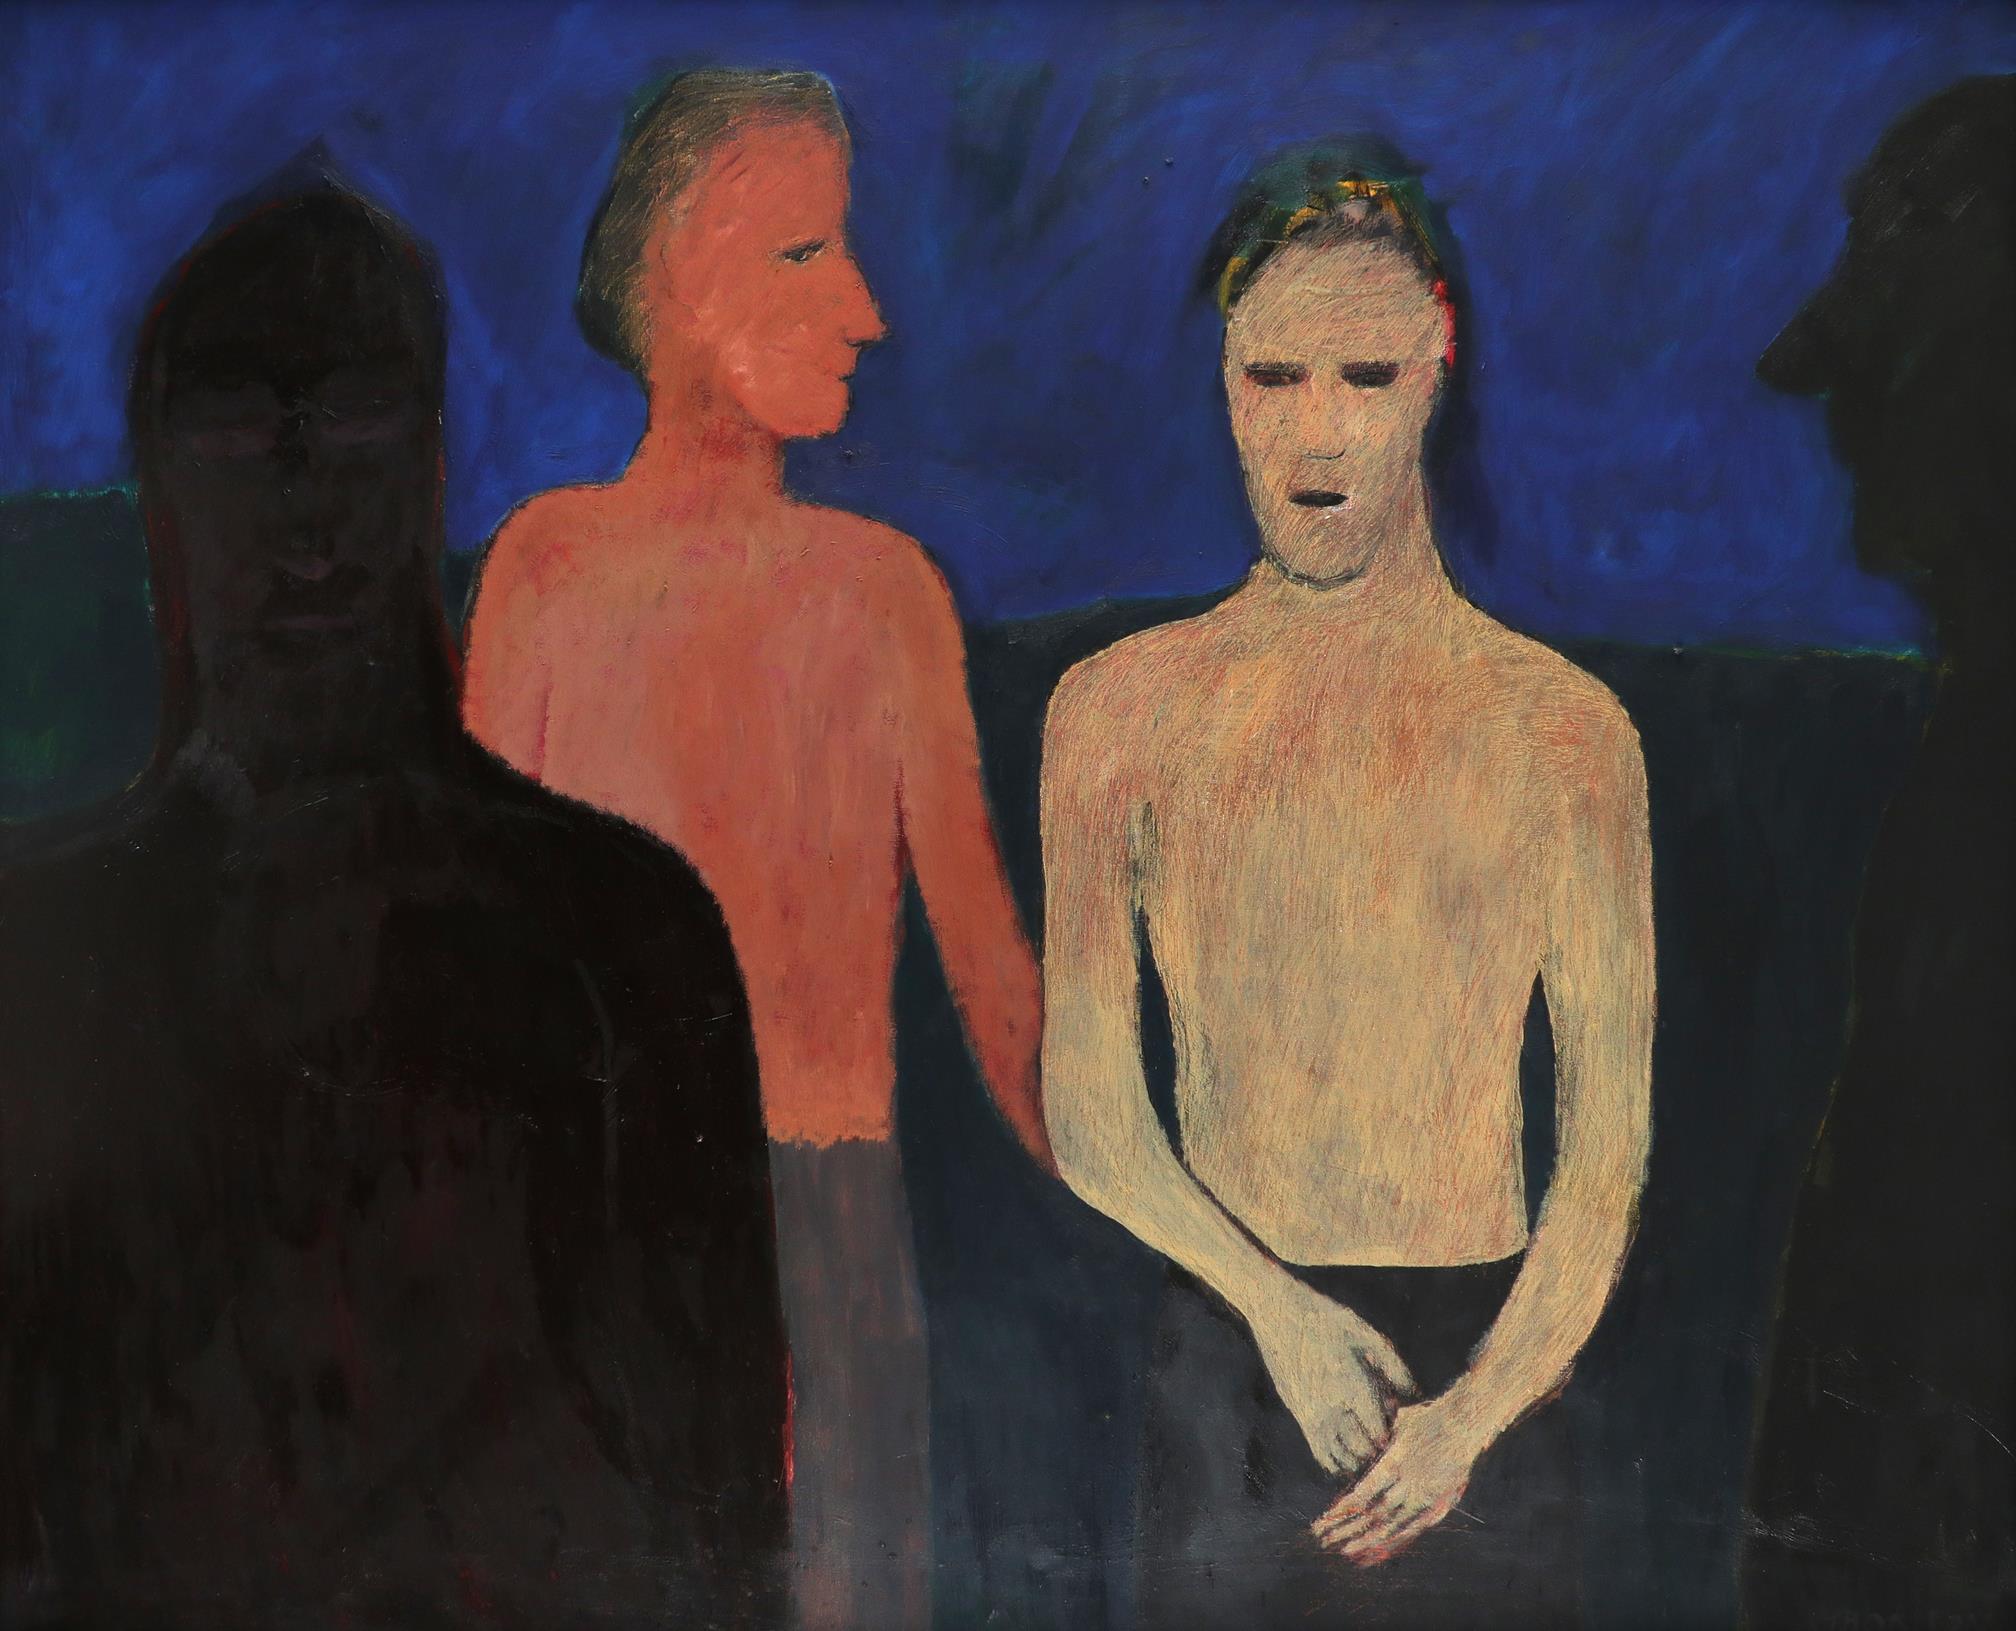 ‡Douglas Thomson (Scottish b.1955) Dawn Signed THOMSON (lower right) Oil on canvas 114.5 x 138cm